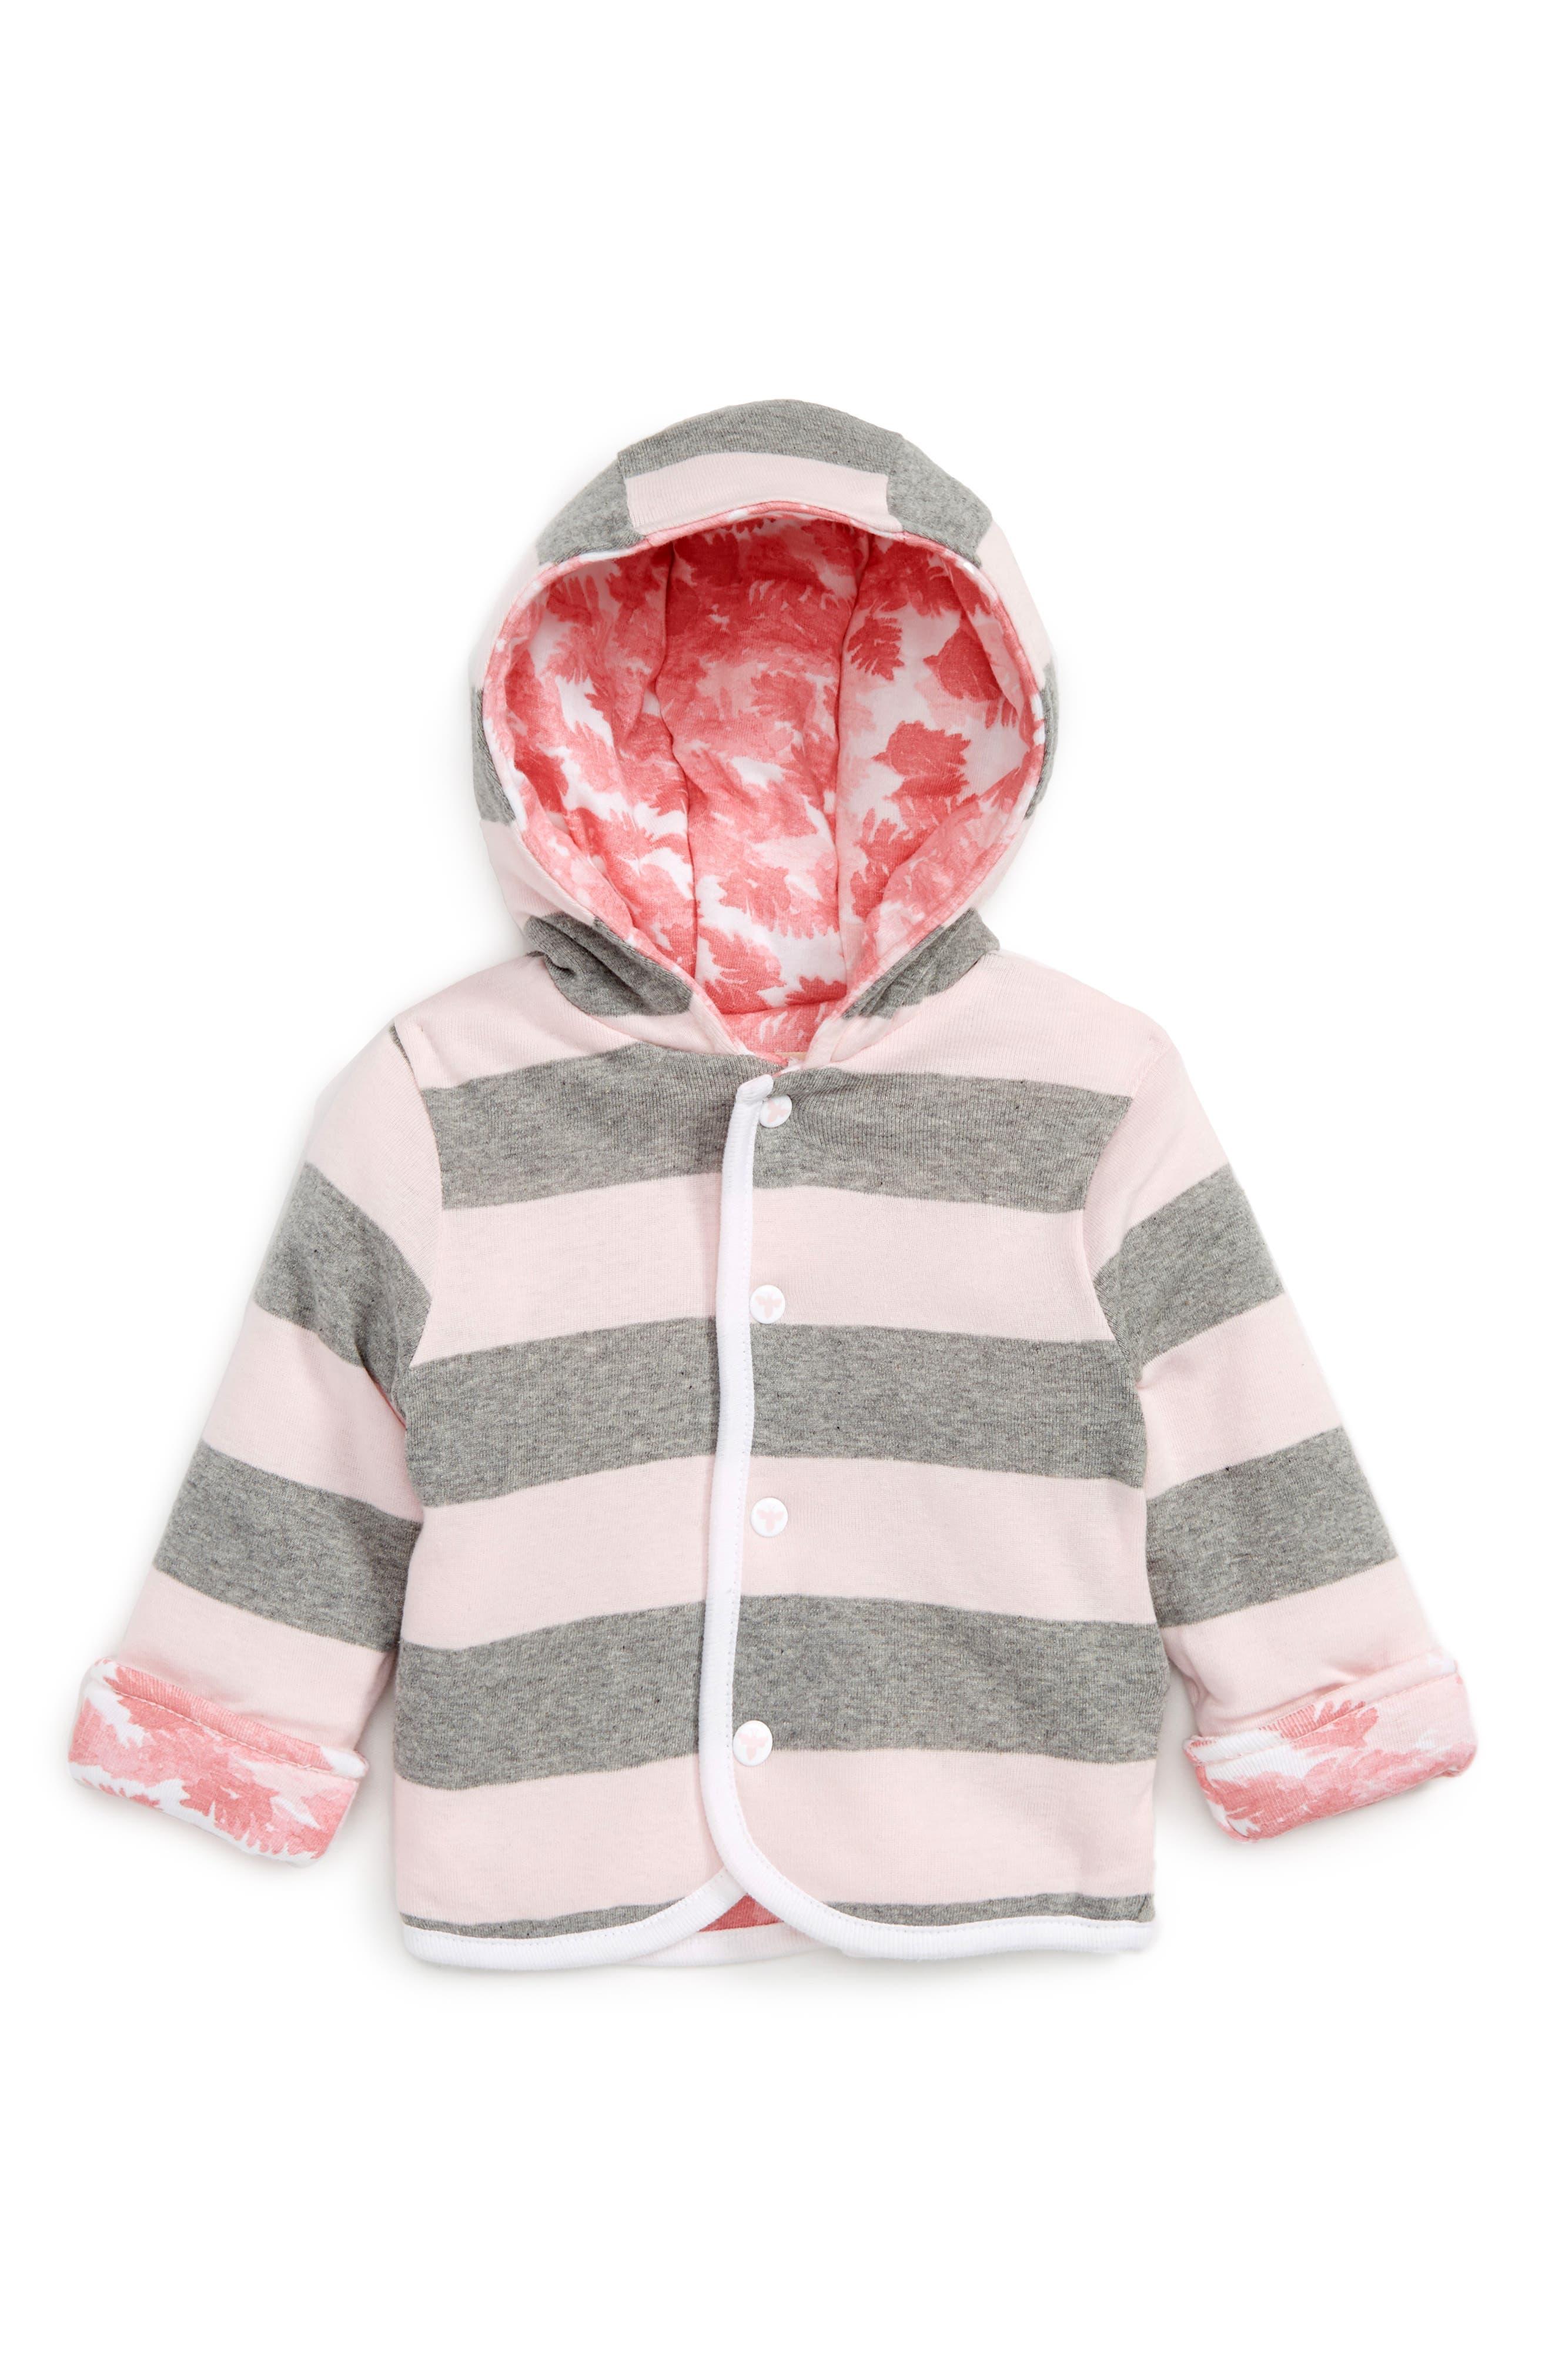 Burt's Bees Baby Organic Cotton Reversible Hooded Jacket (Baby Girls)